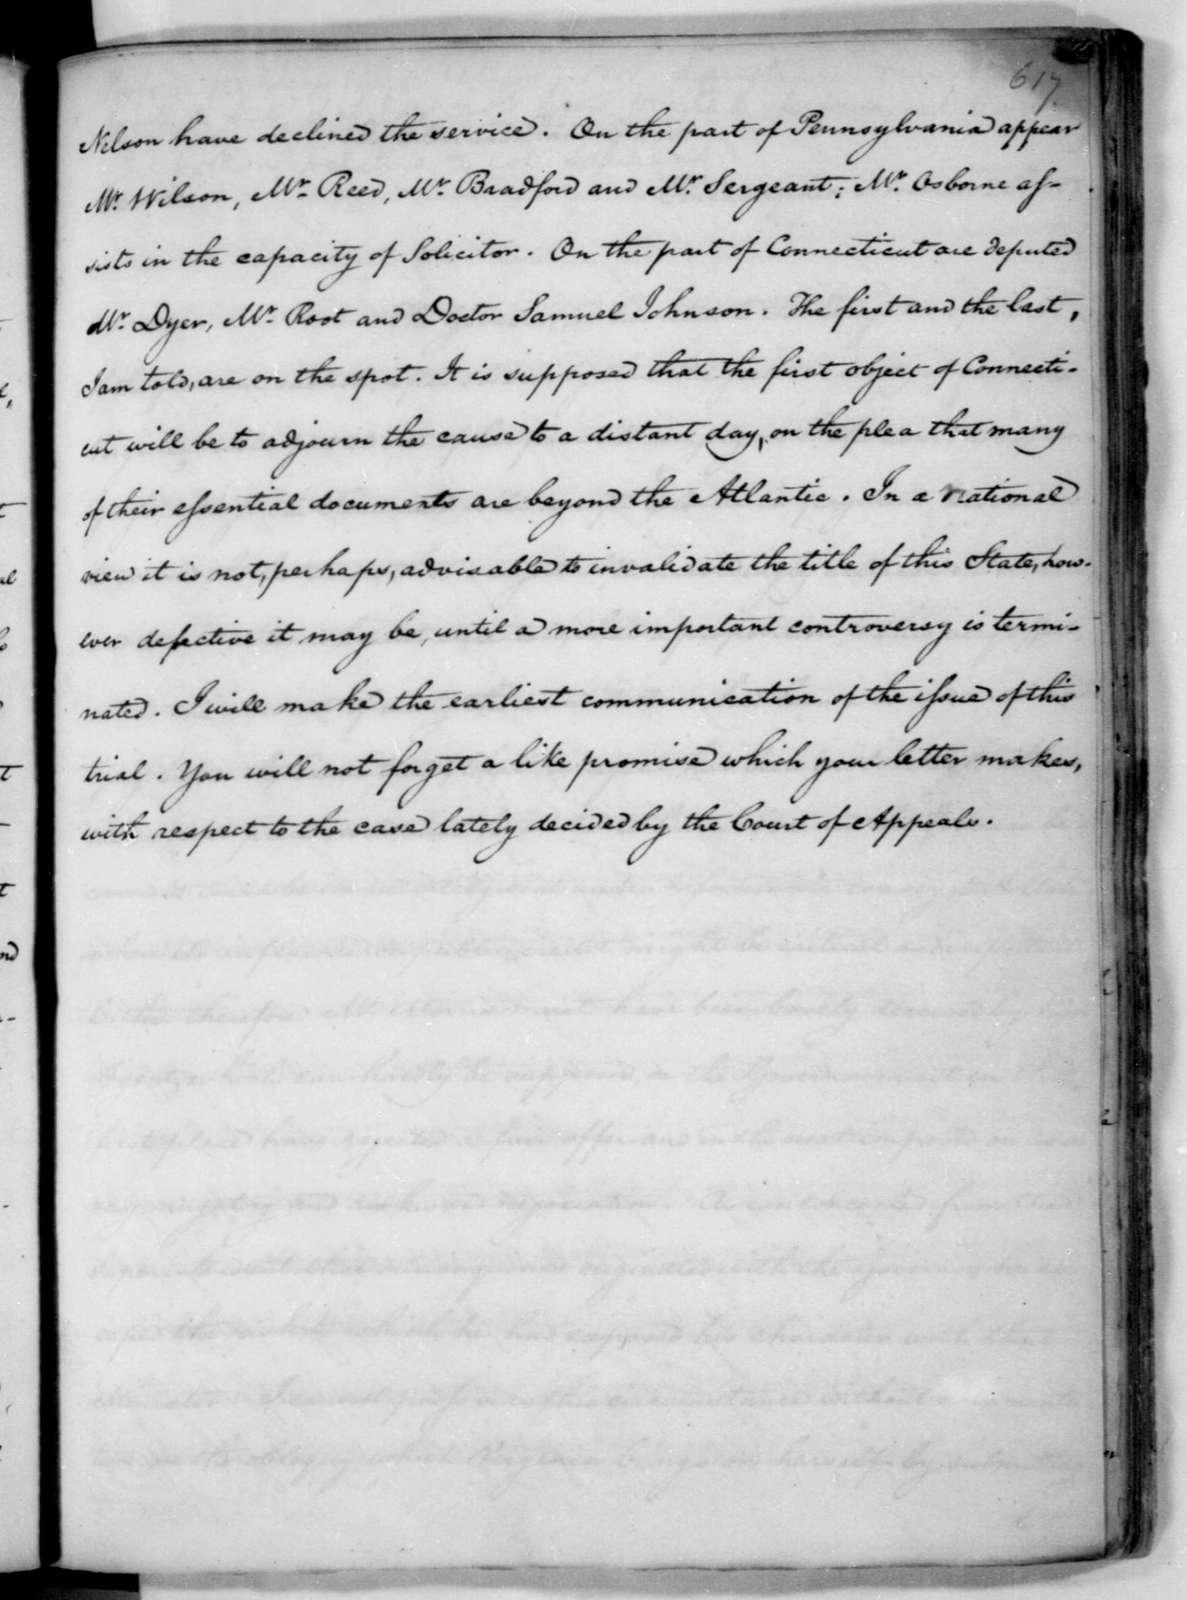 James Madison to Edmund Randolph, November 19, 1782.